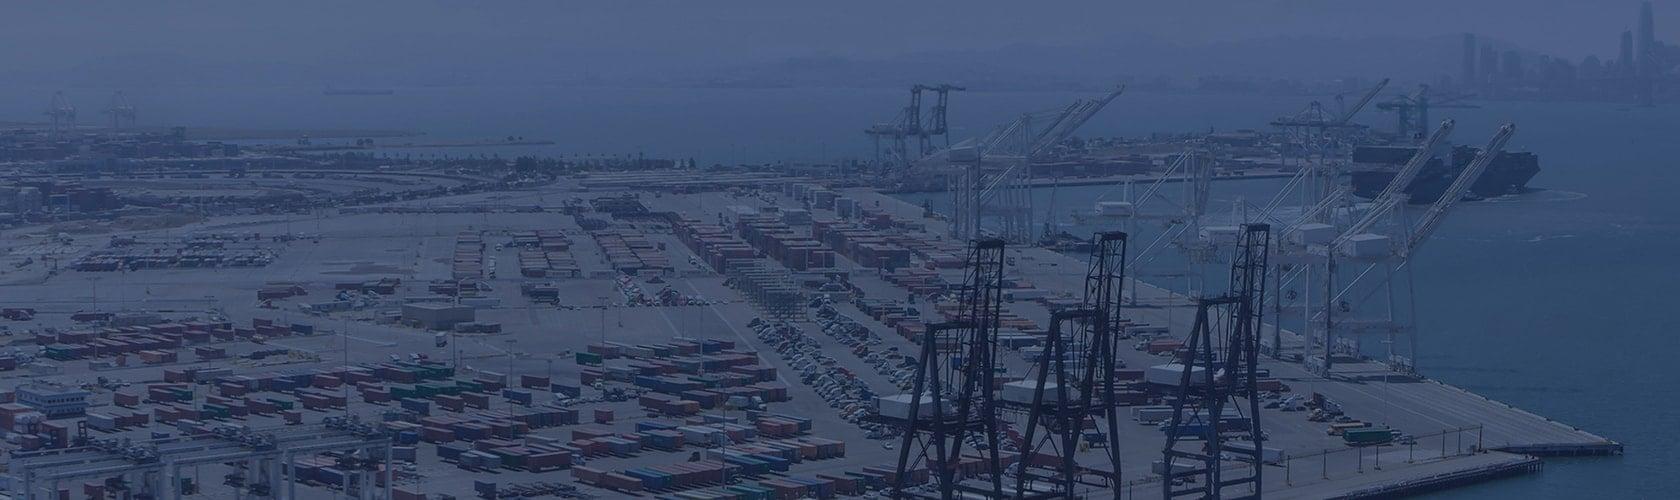 Fighting Illegal Trade in California